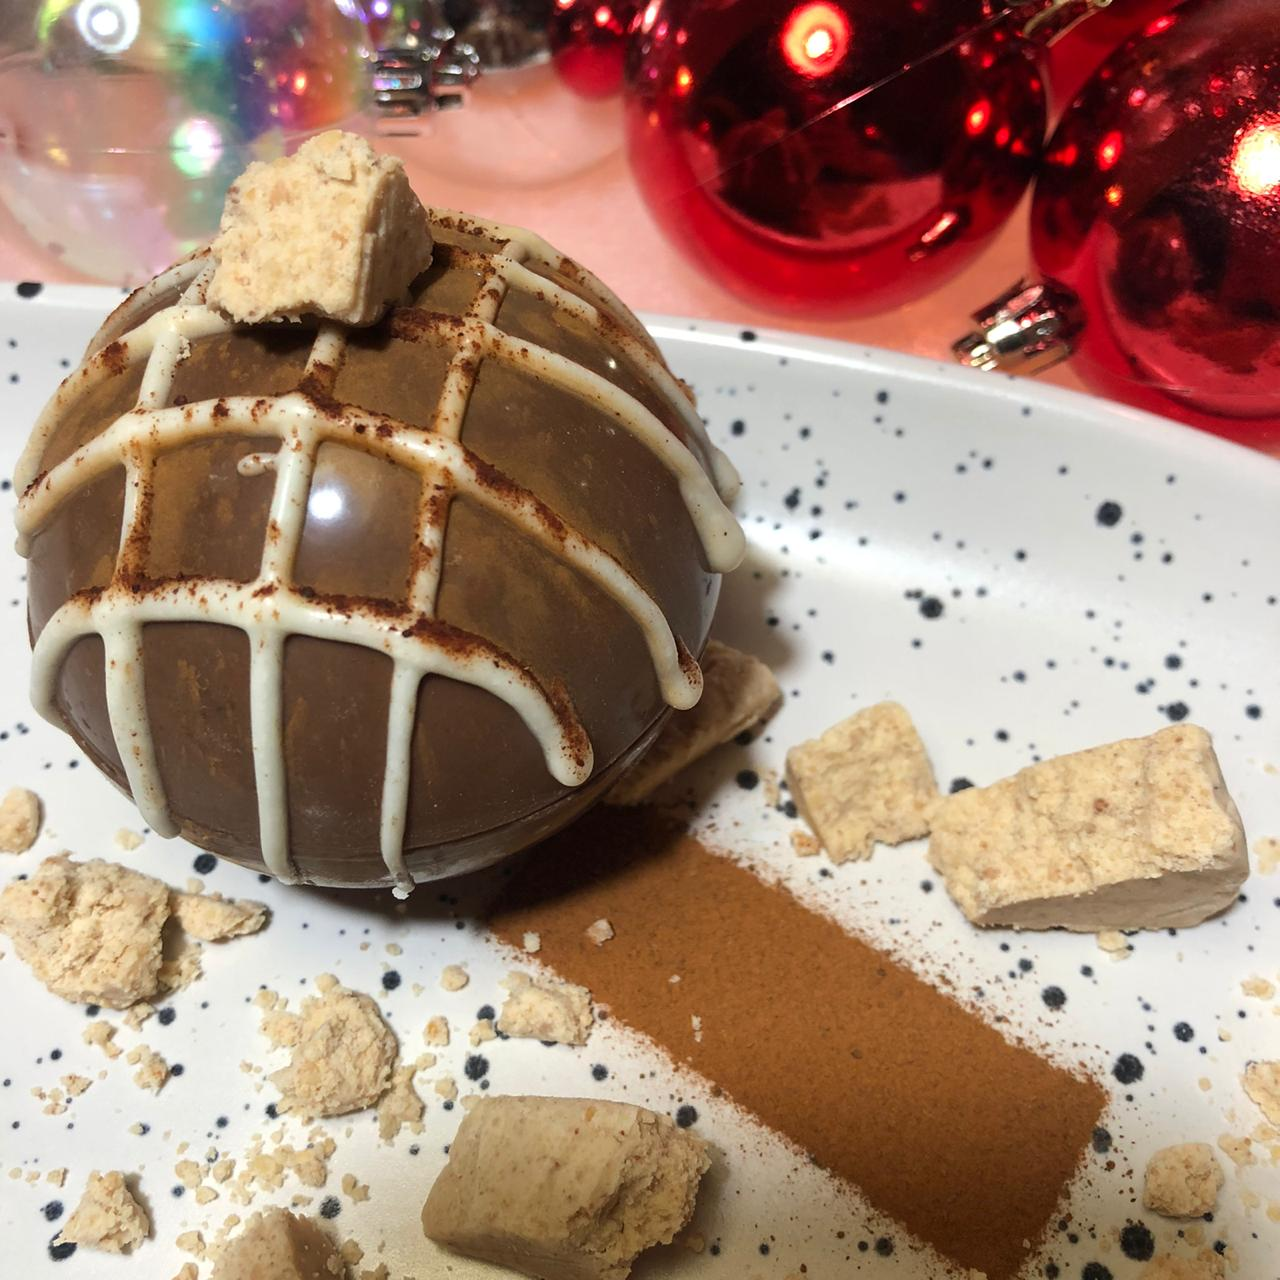 Chocolate Abuelita.